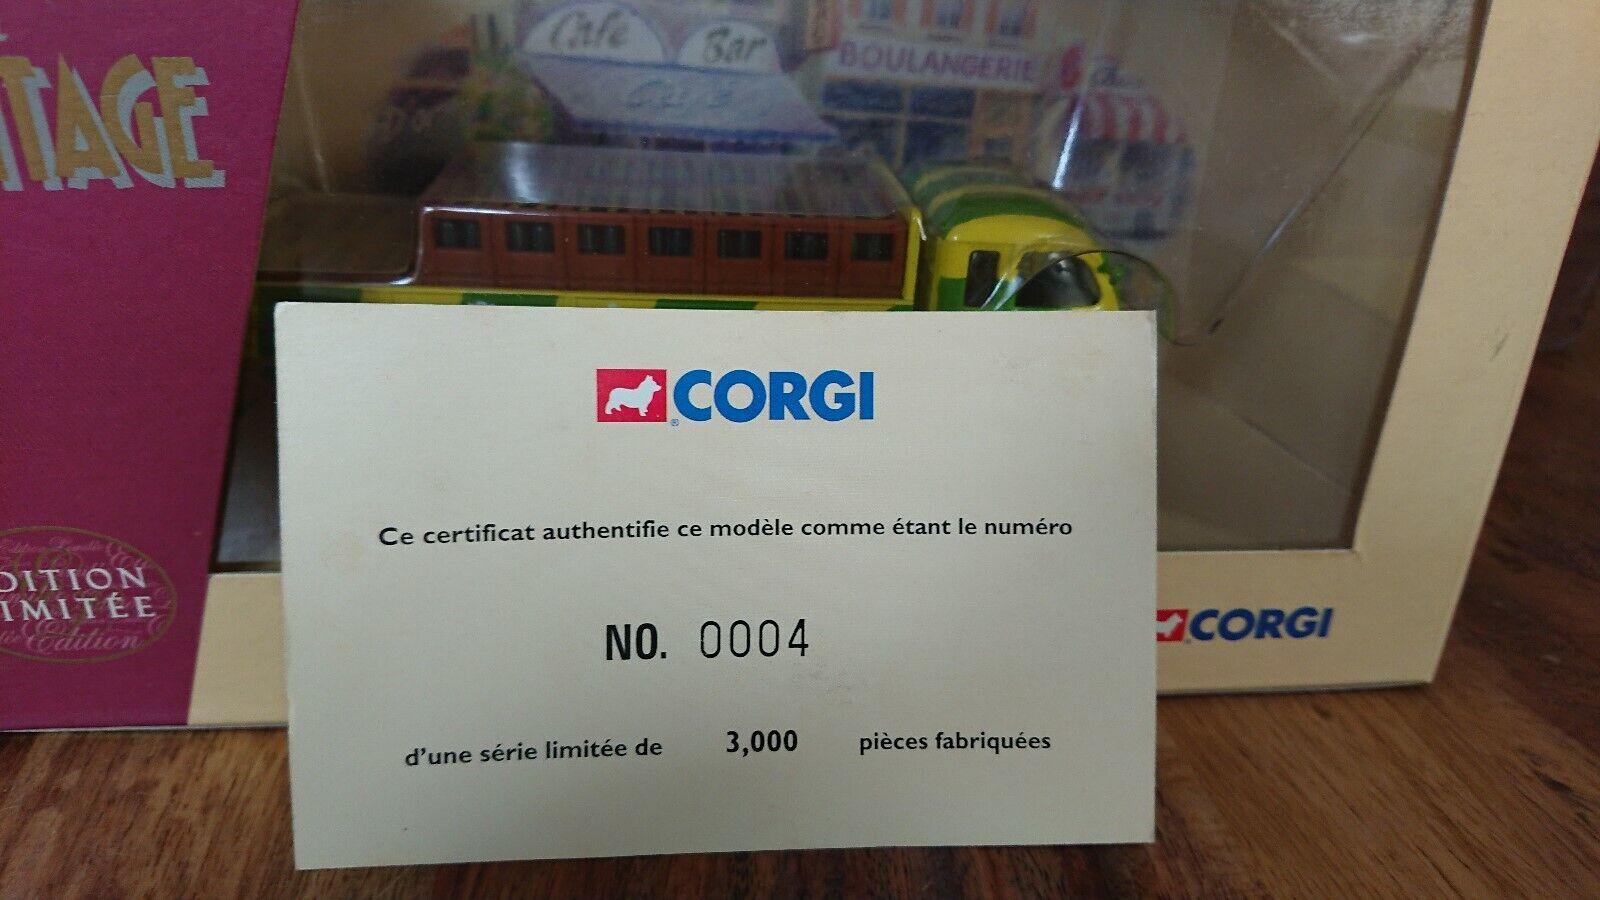 Corgi 71106 Saviem Bransseur PERRIER Ltd Edit. No. 0004 of of of 3000 413ba7